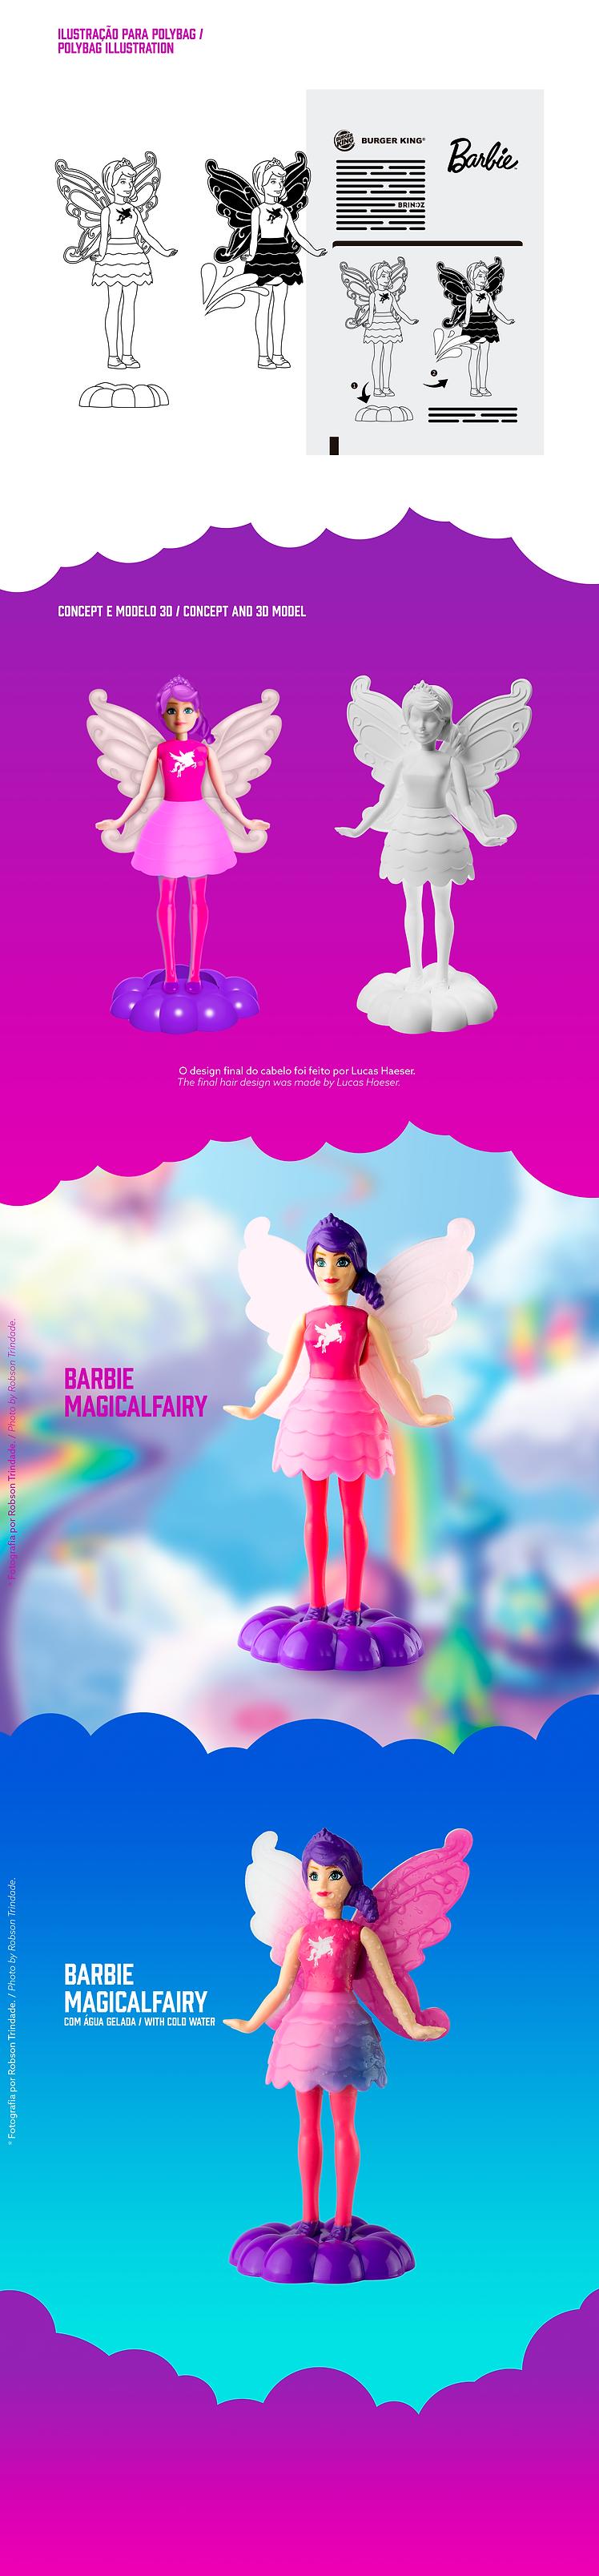 Behance---Barbie-Clouds---04B.png